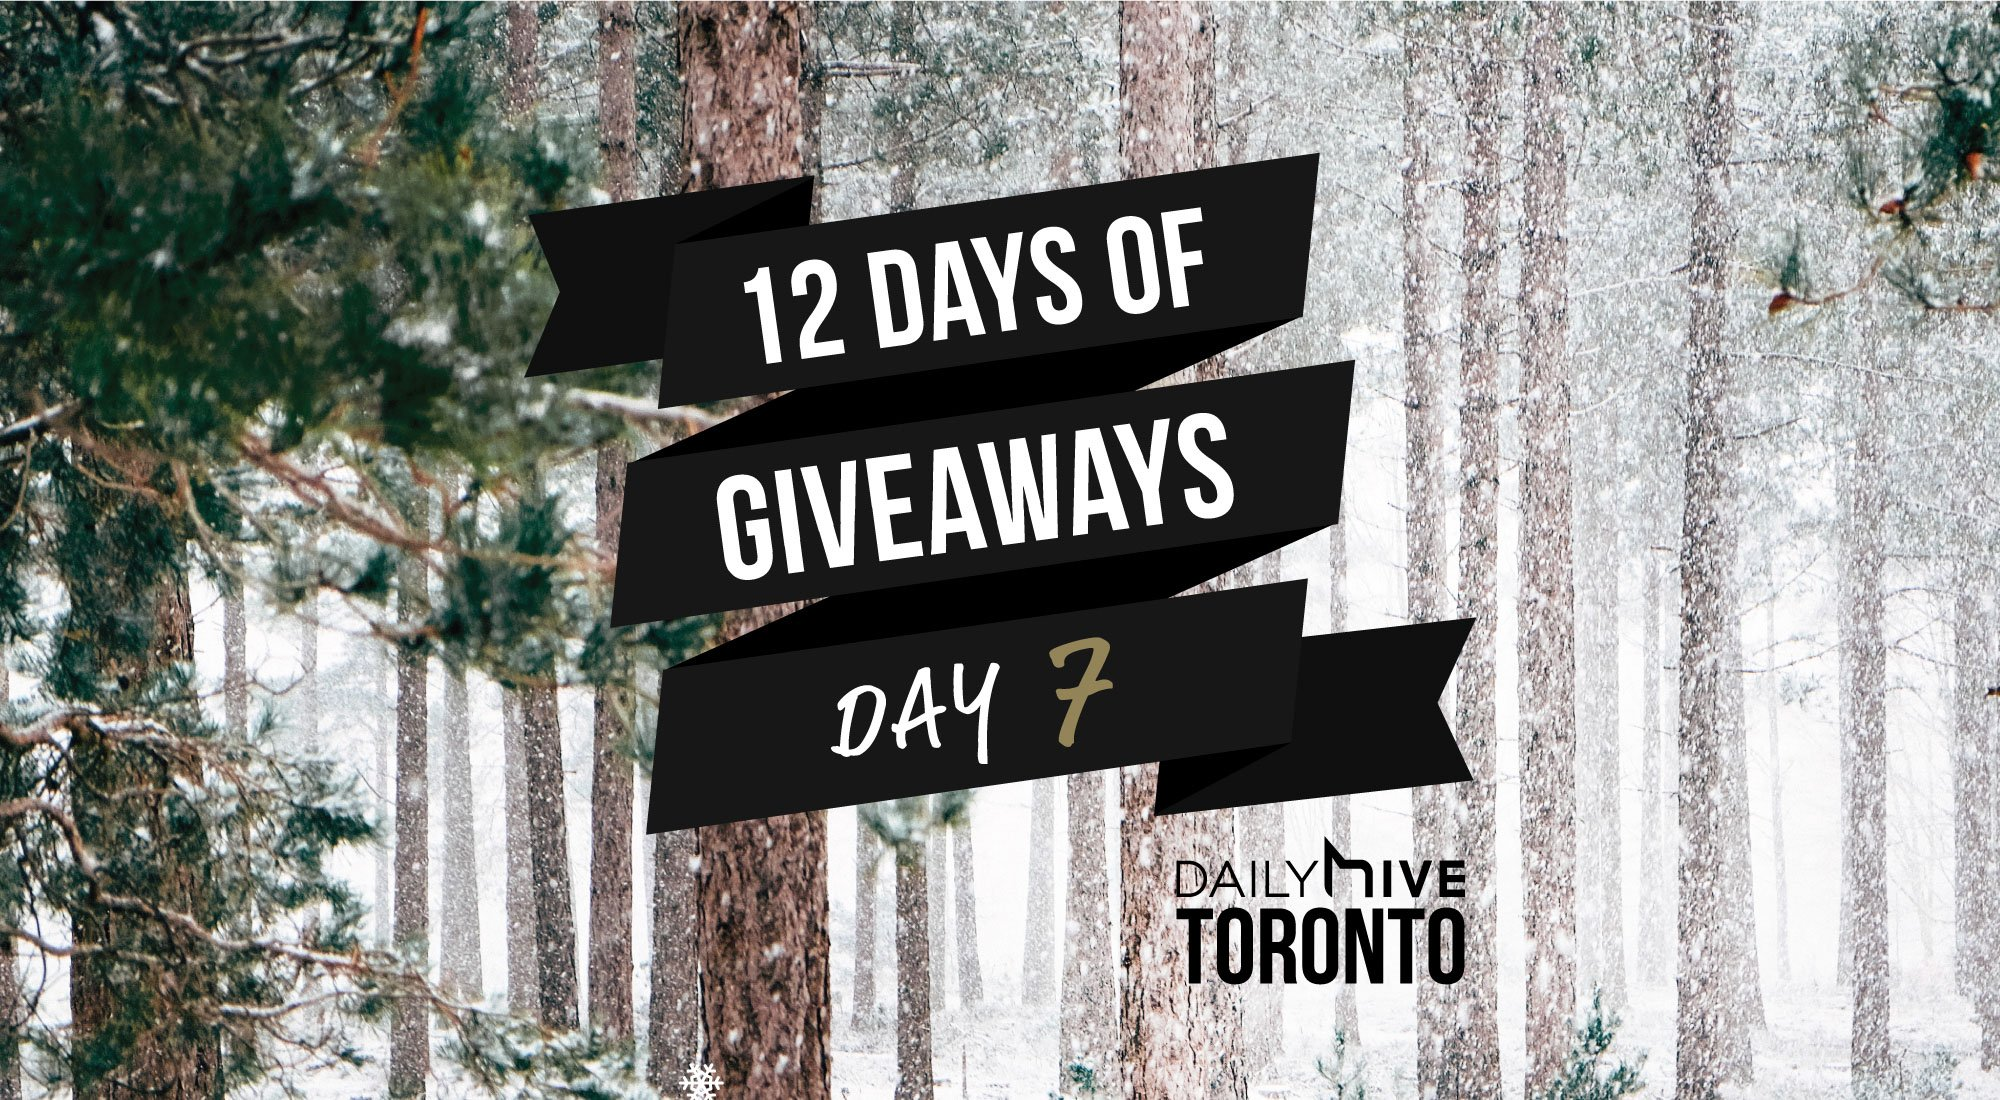 12 days of giveaways toronto 7